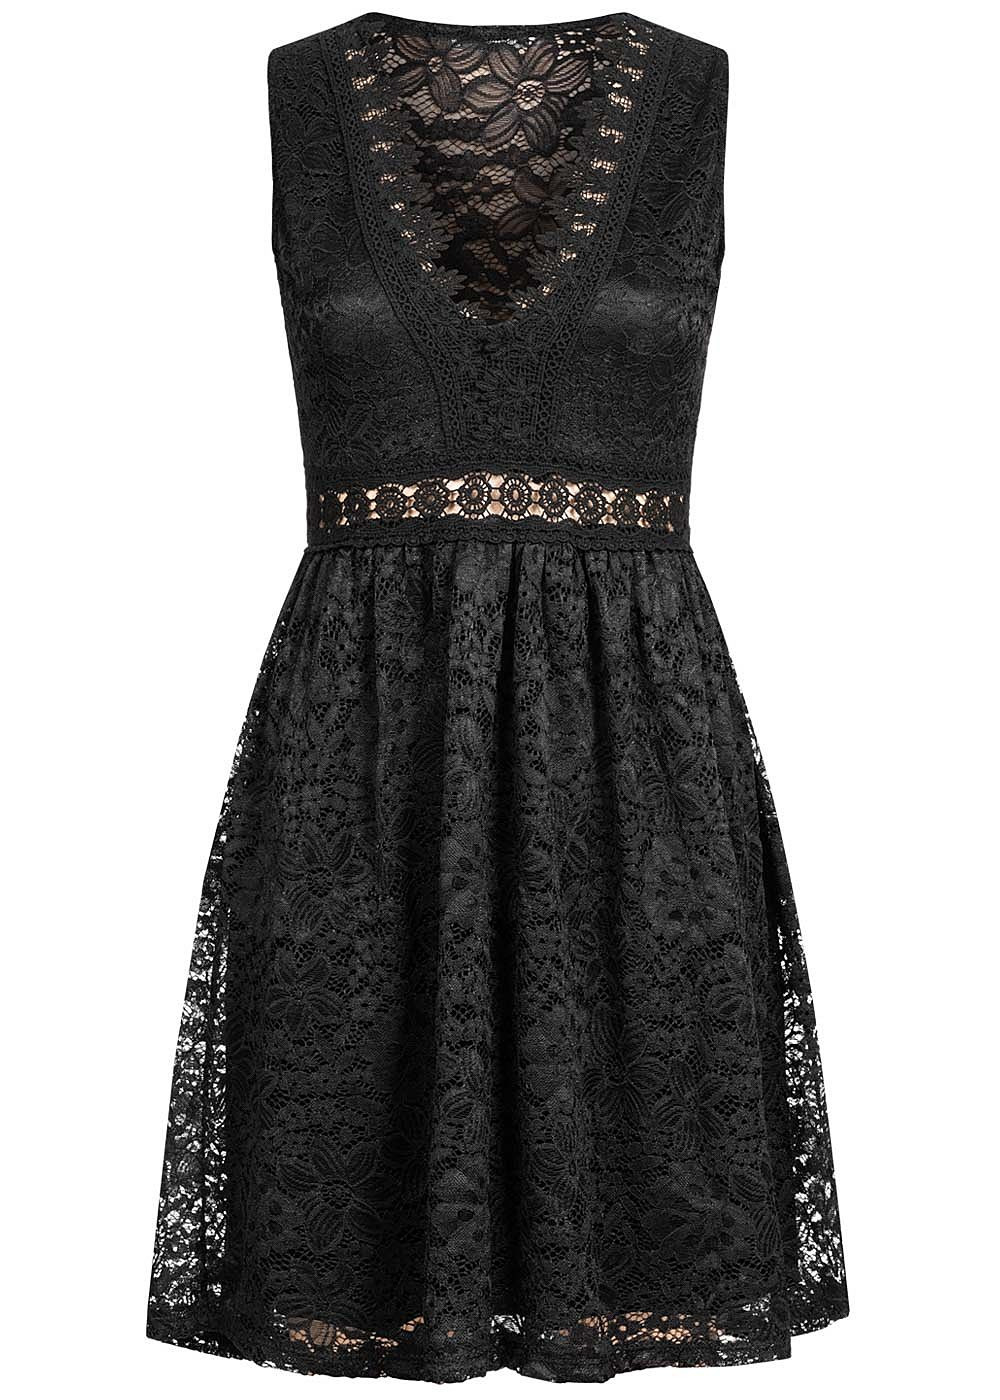 Hailys Damen Vneck Mini Spitzen Kleid 2Lagig Schwarz